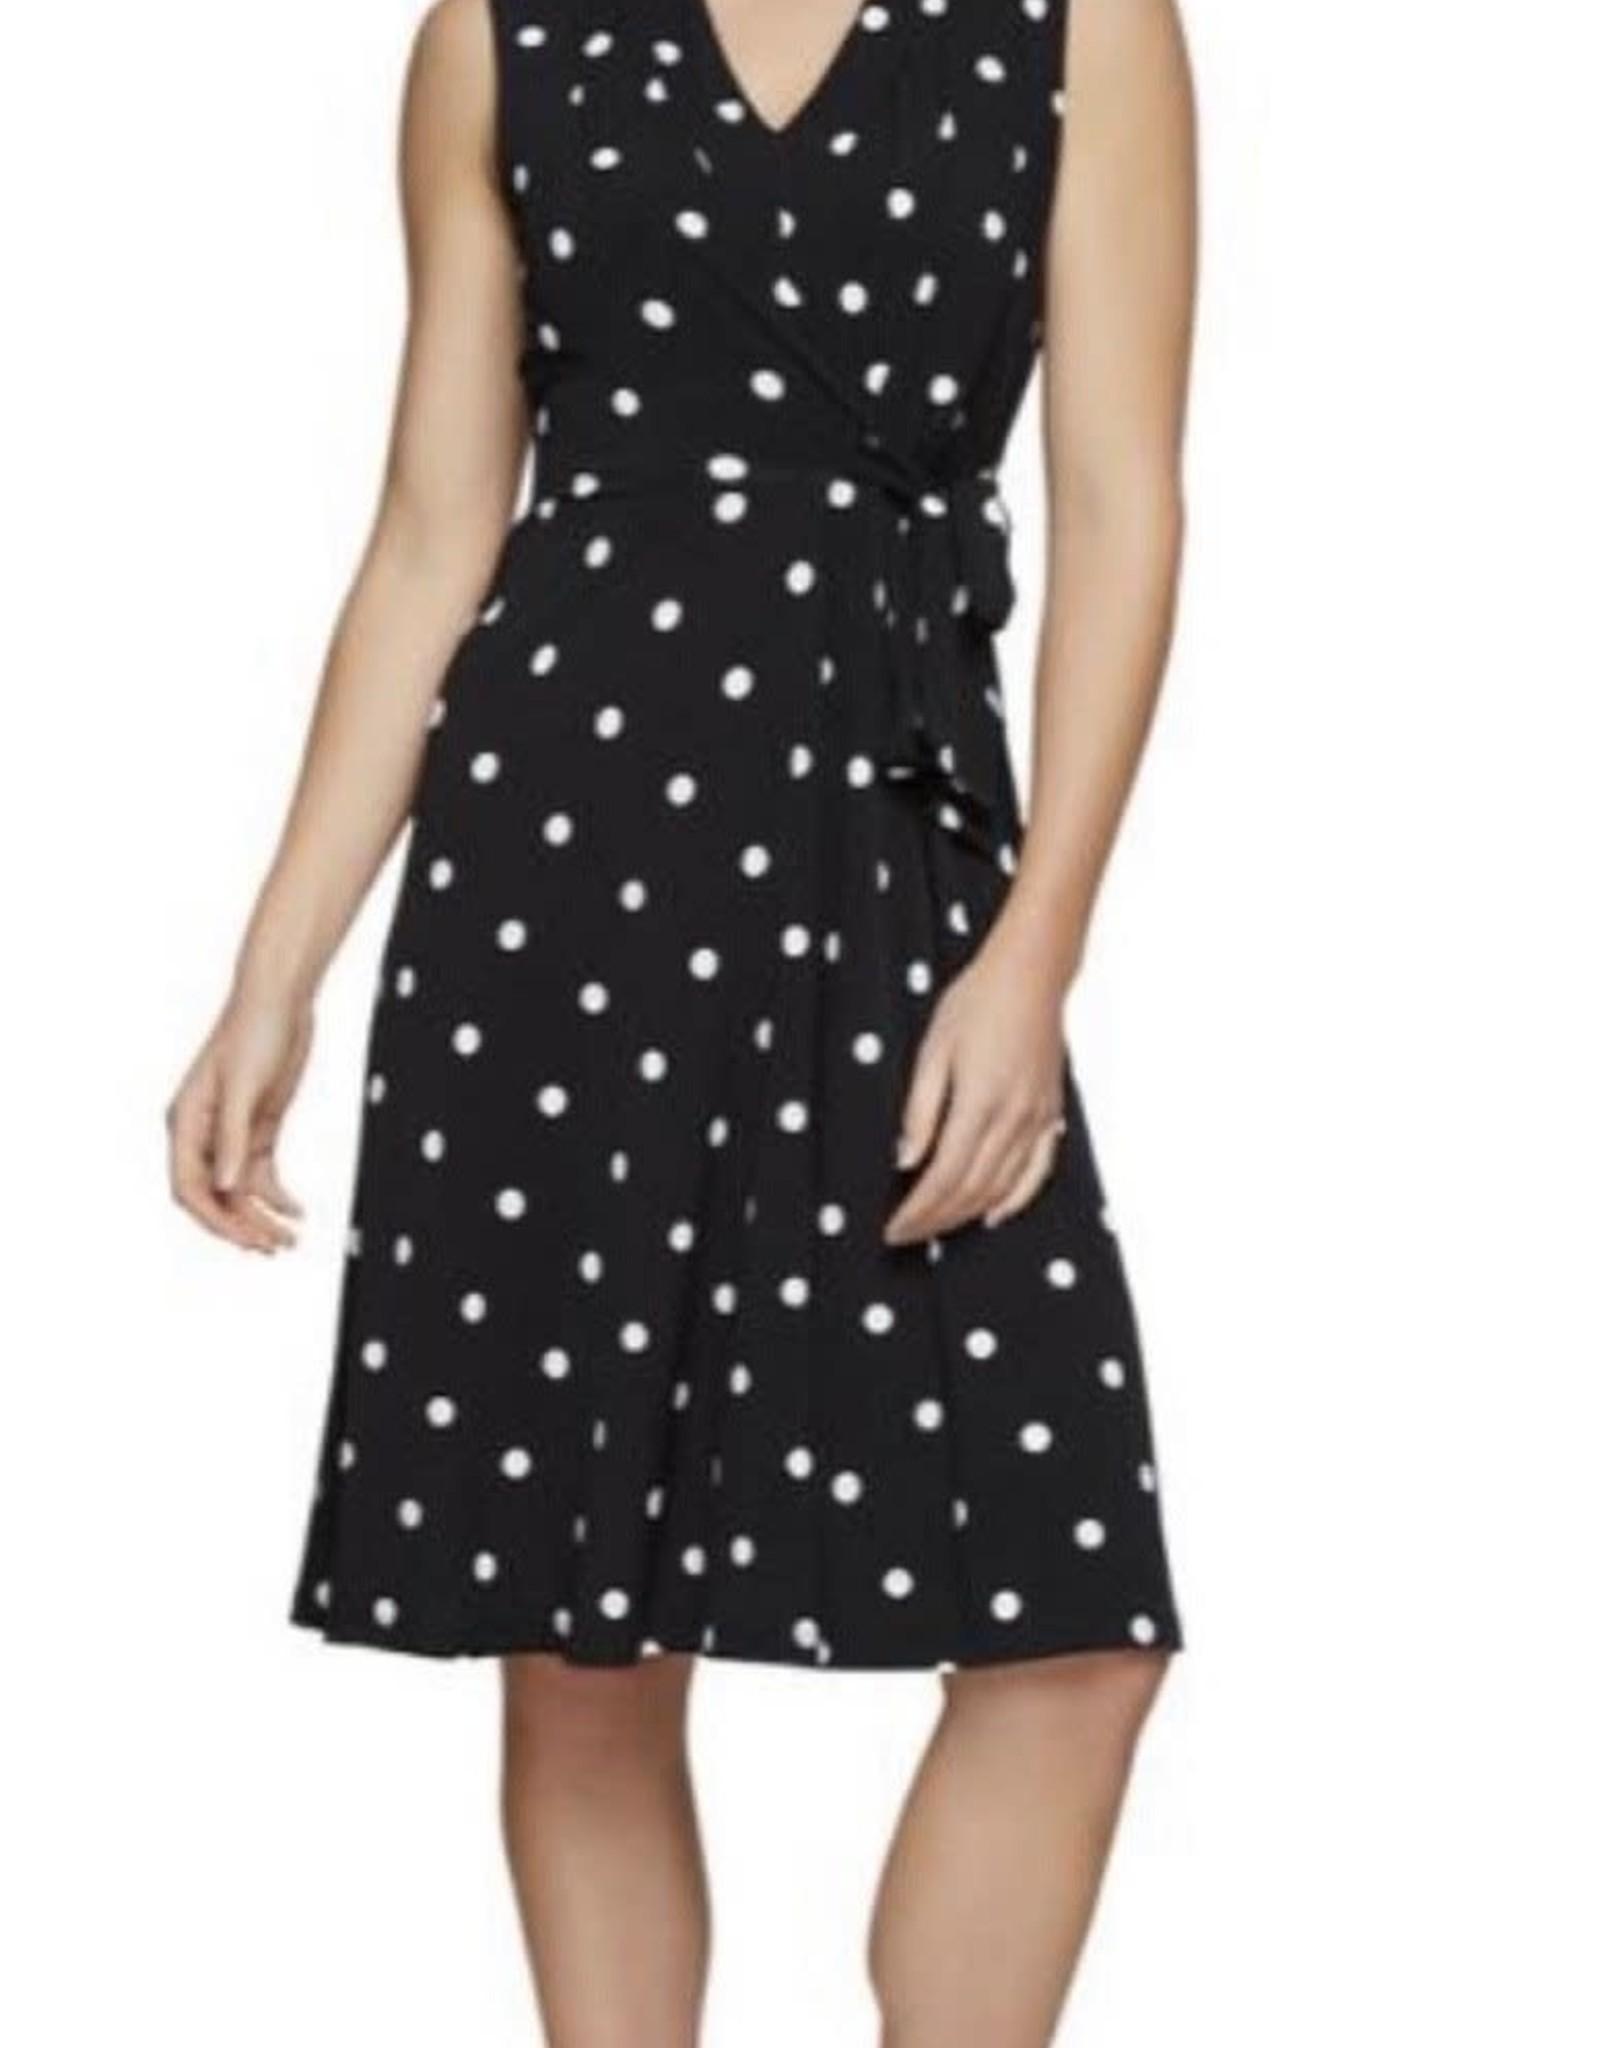 Jersey Girl Jersey Girl - Spotted dress Black